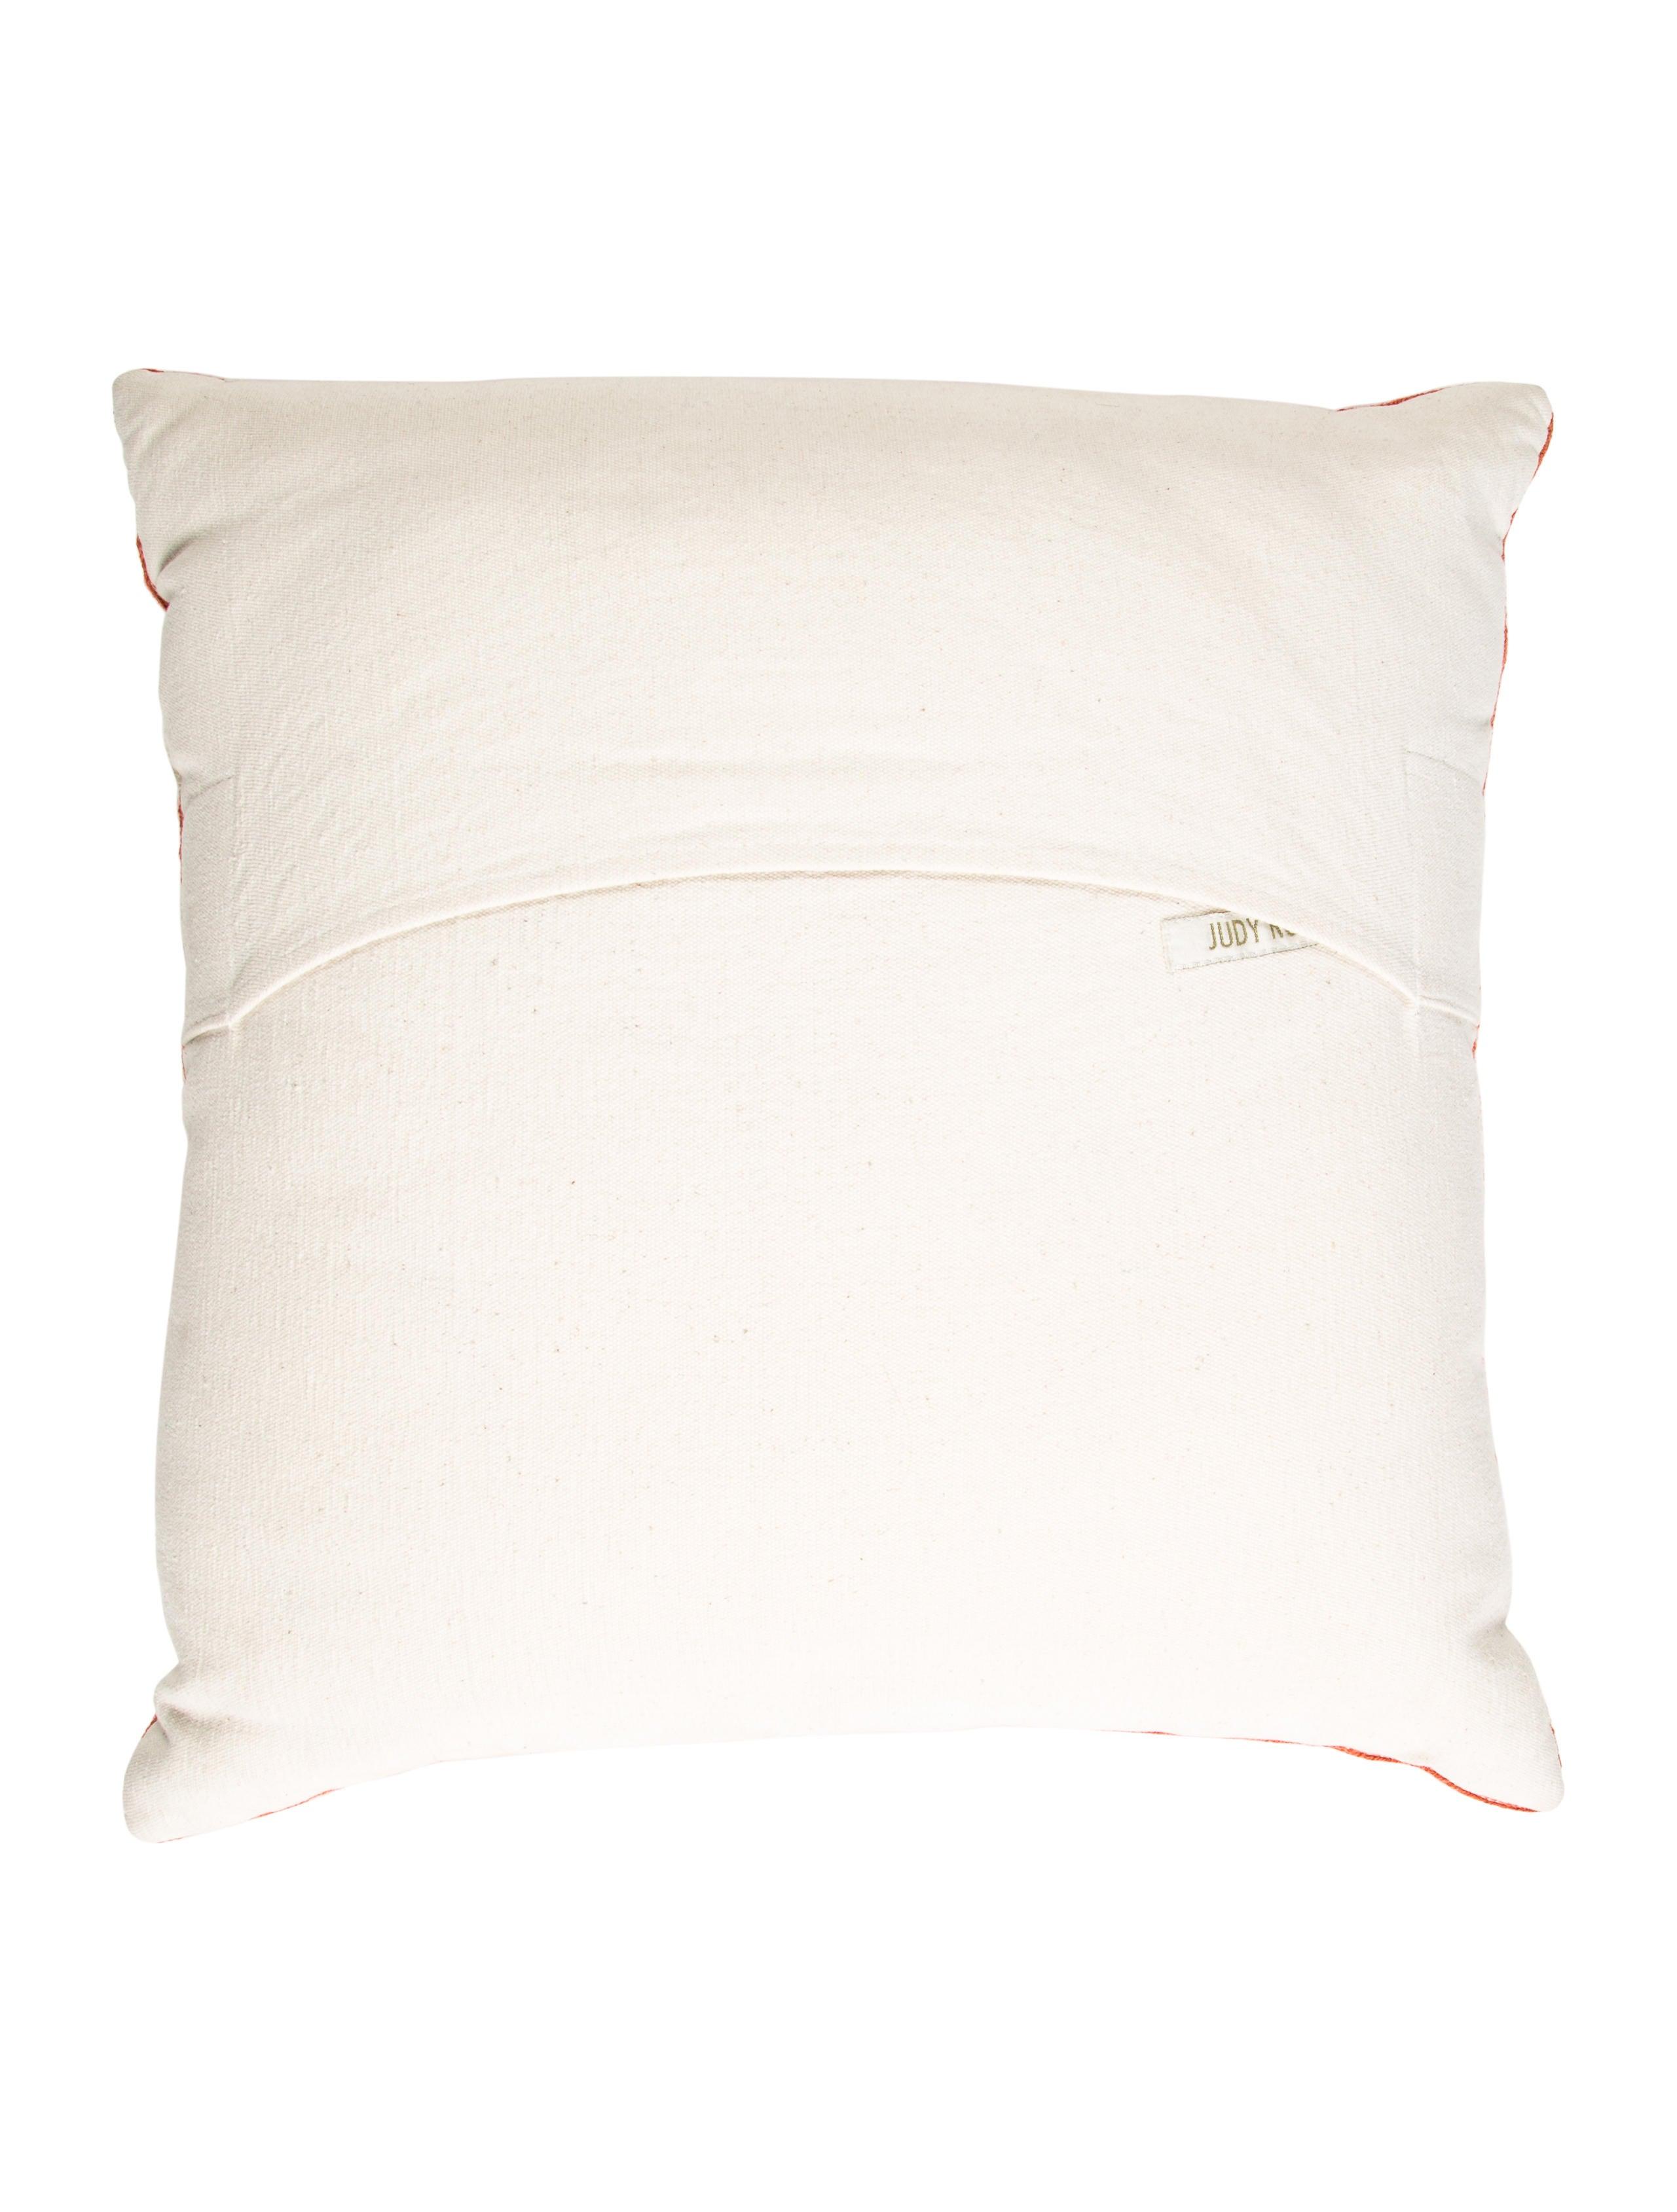 Judy Ross Throw Pillow - Pillows And Throws - PILLO20130 The RealReal